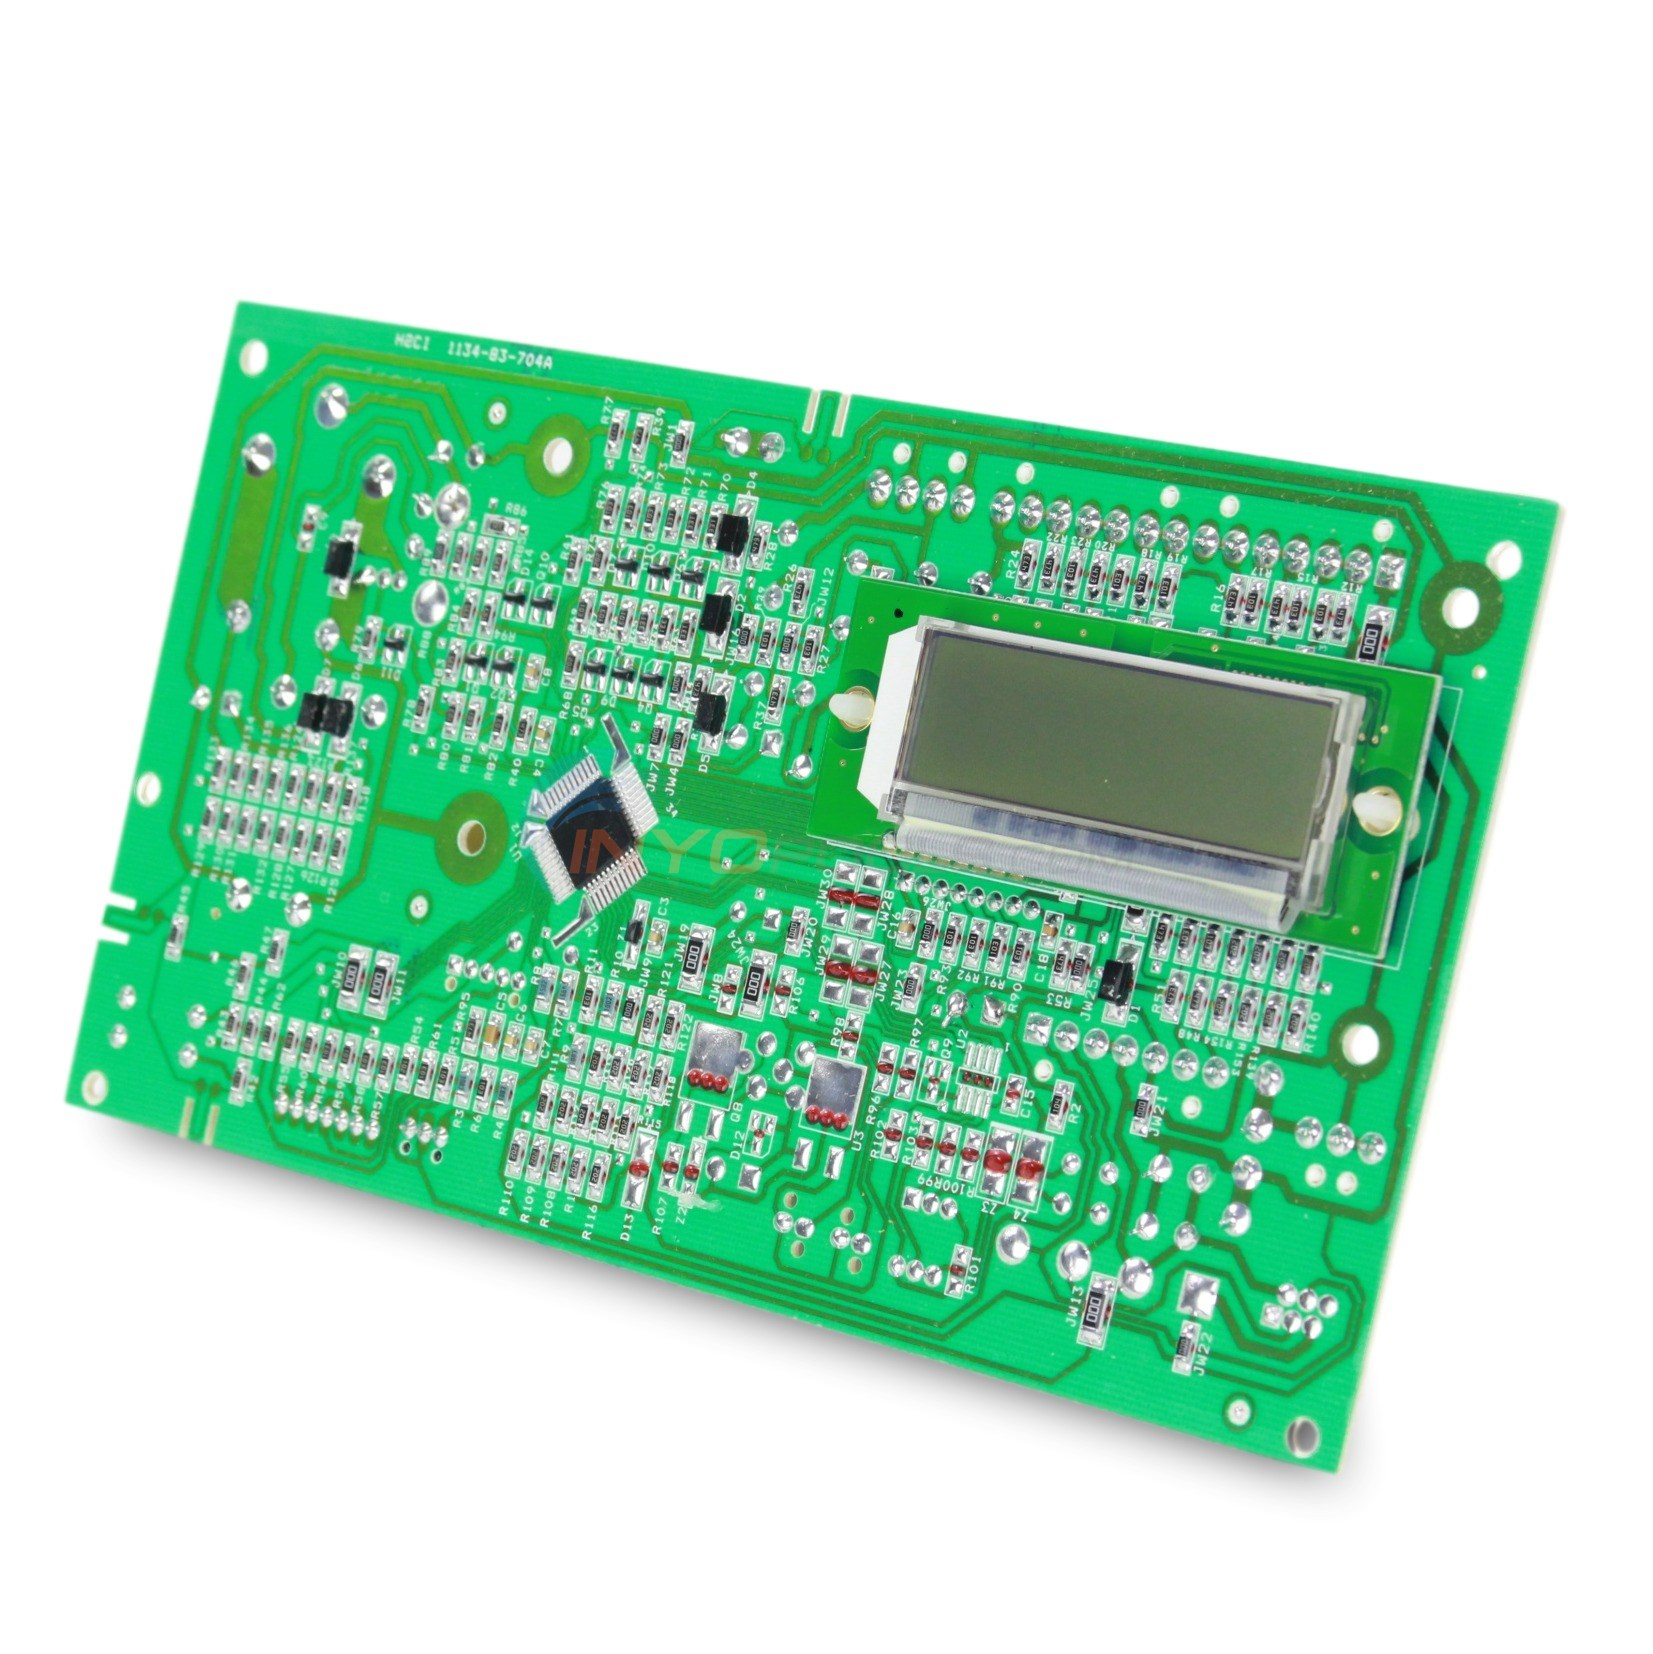 Raypak PCB Control & 3 Wire, Kit - 013464F